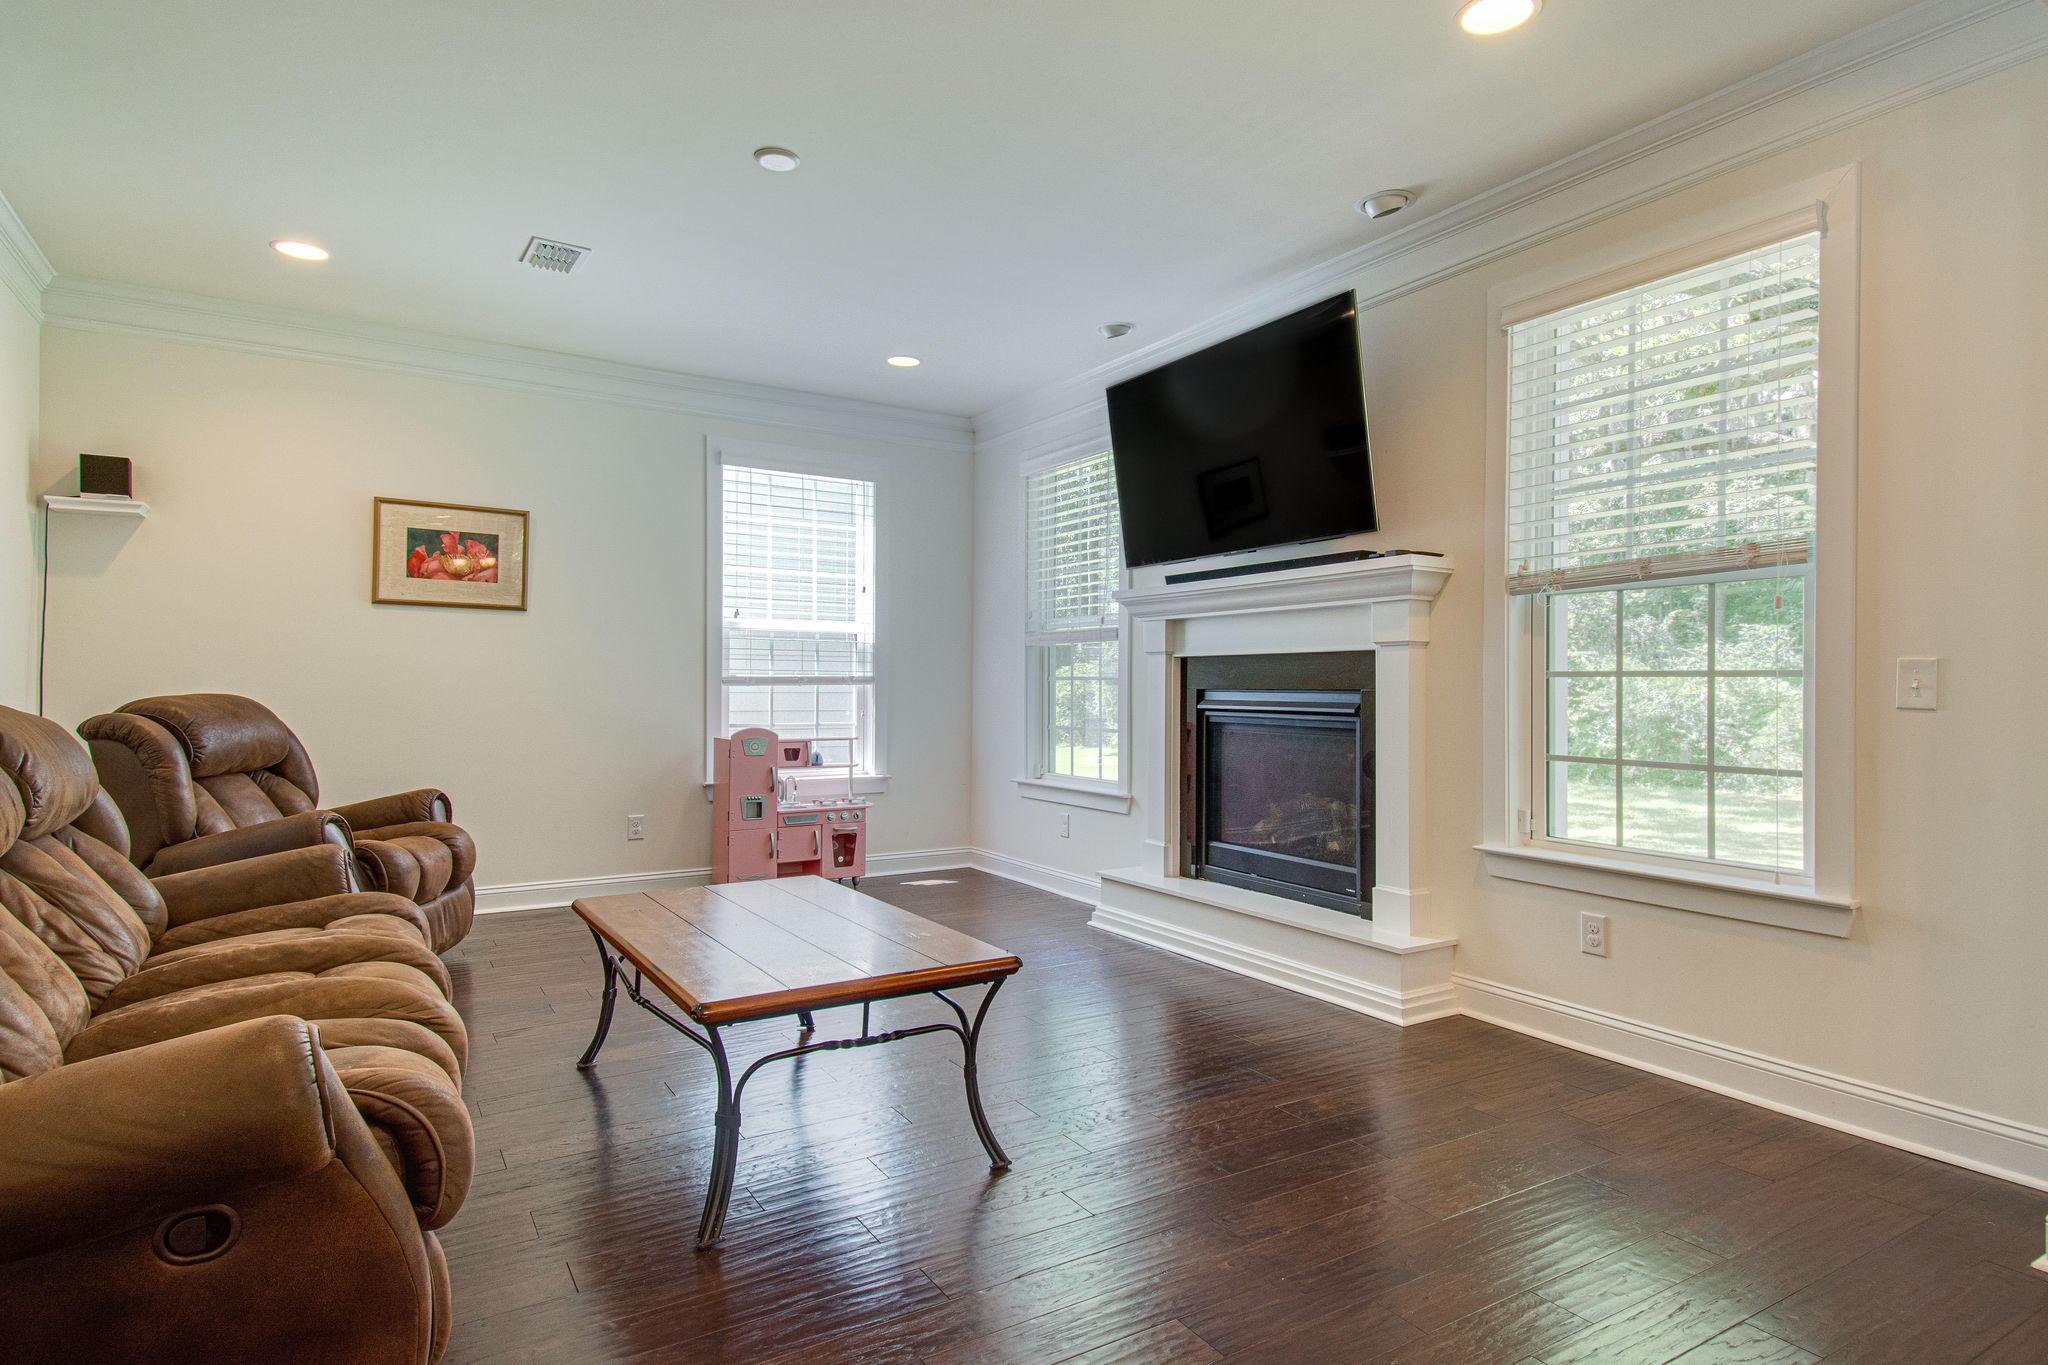 Magnolia Village Homes For Sale - 1261 Pearwood, Mount Pleasant, SC - 10